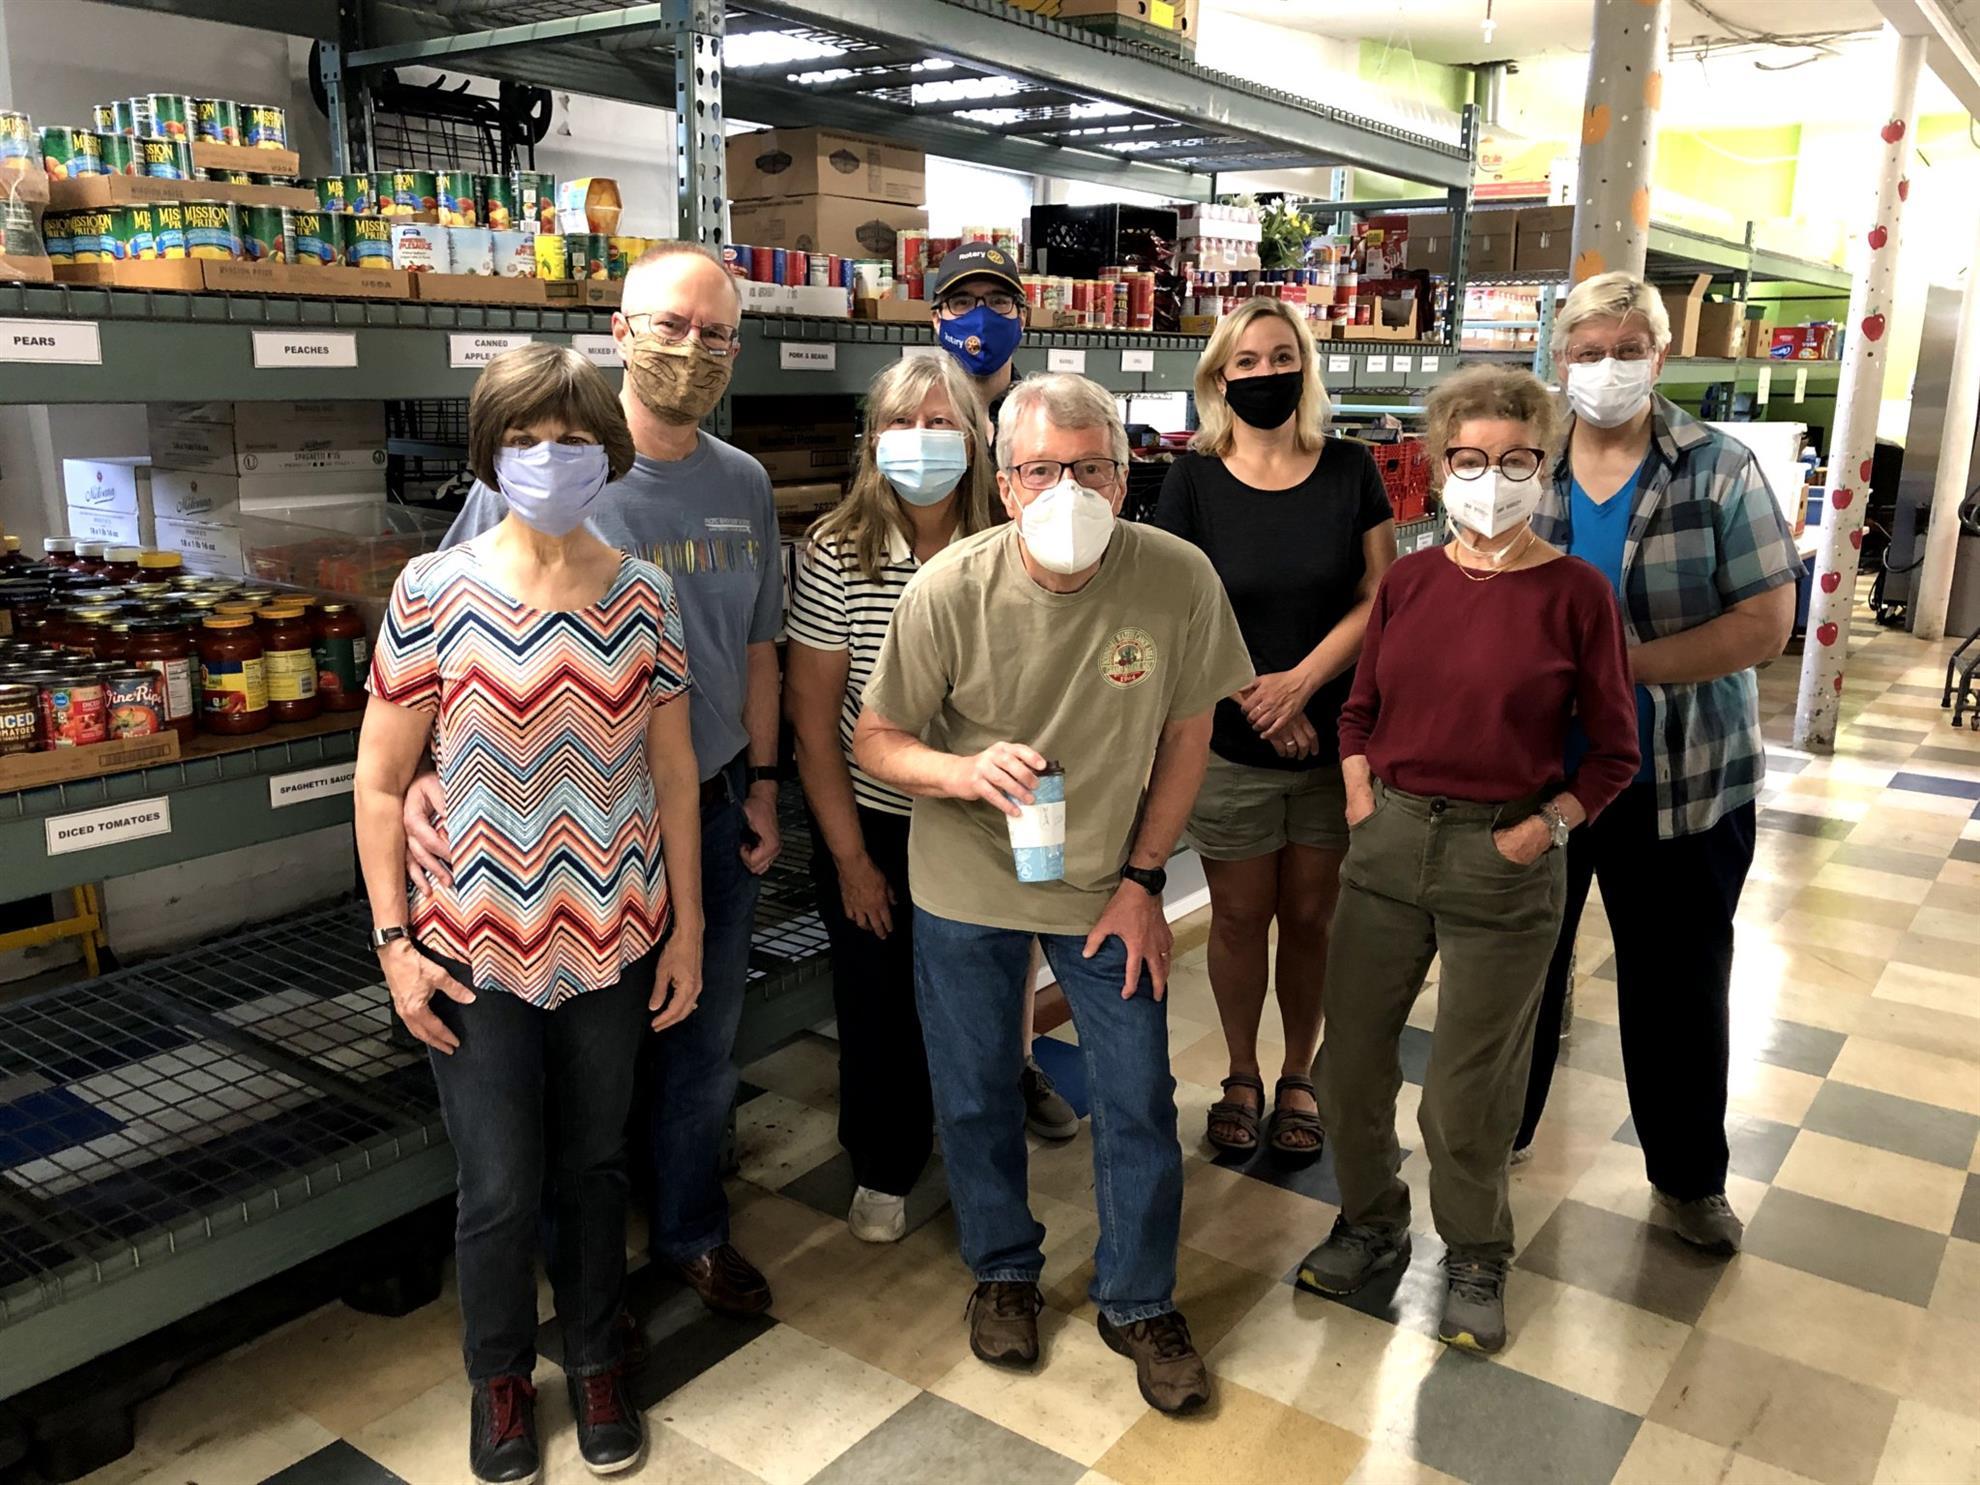 8 Rotarians return to serve at CES Food Shelf